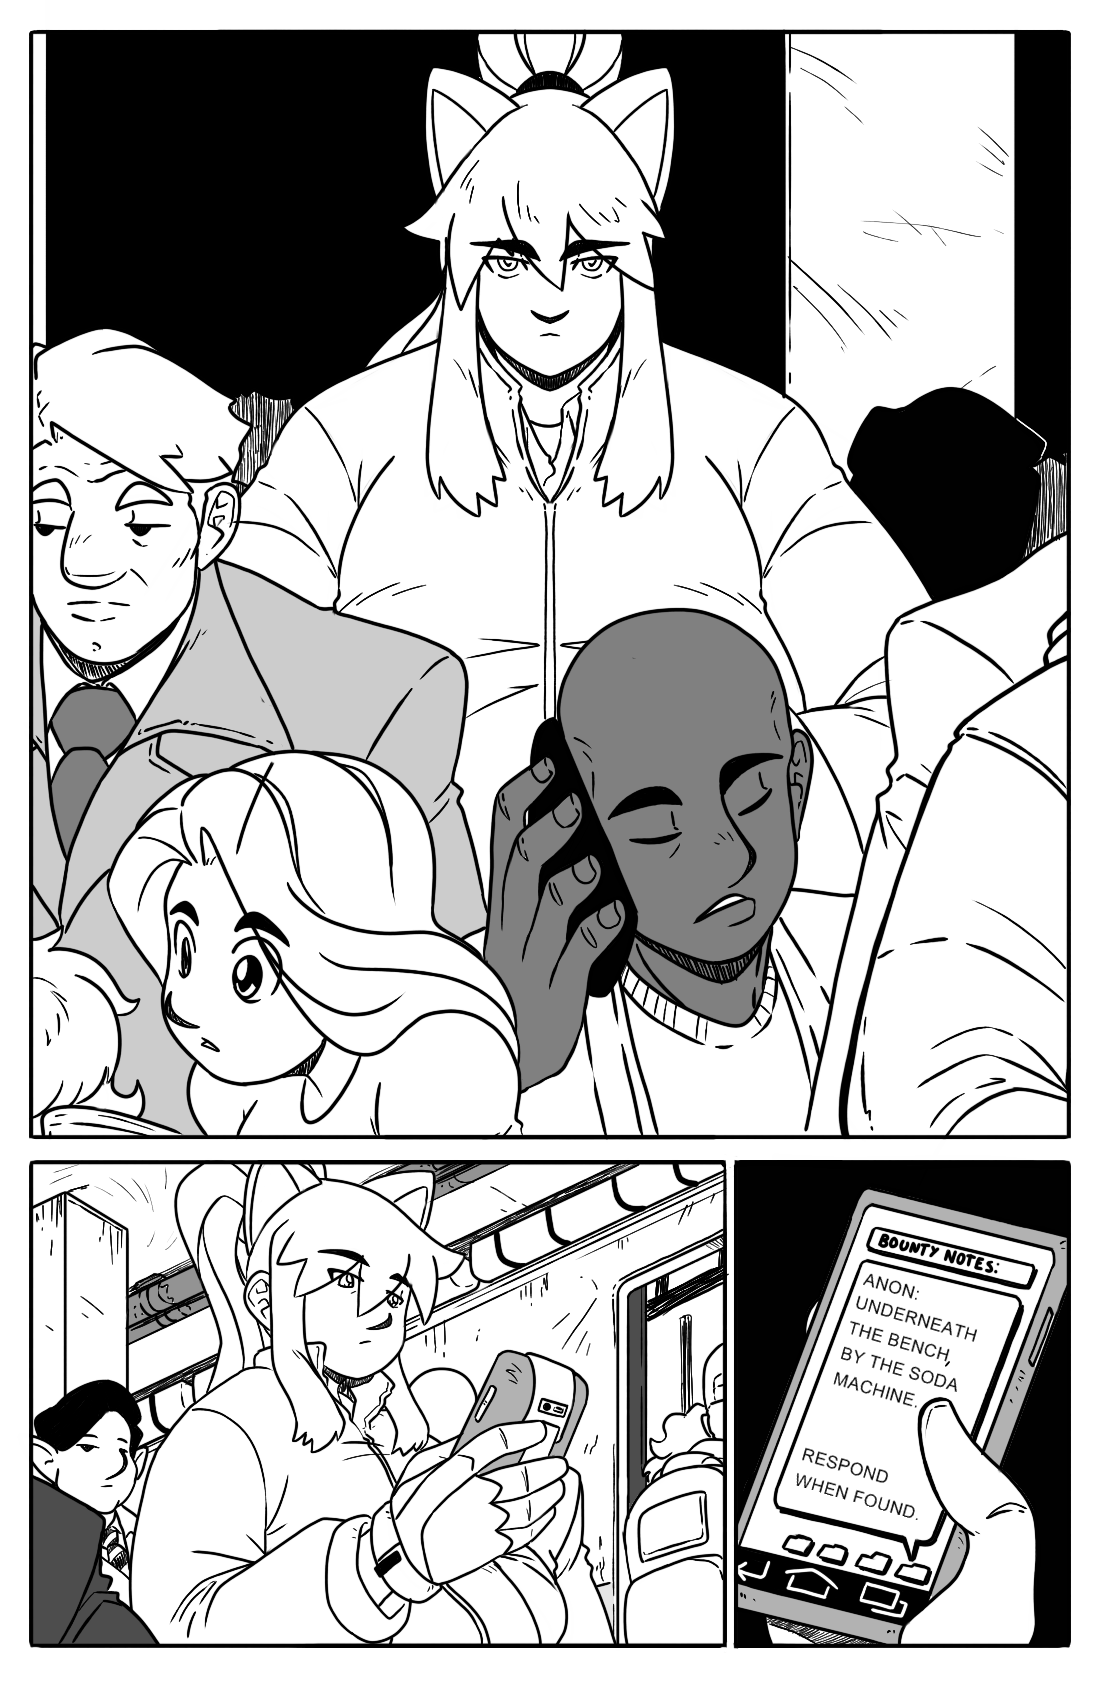 Pony Express Part 1 pg.3